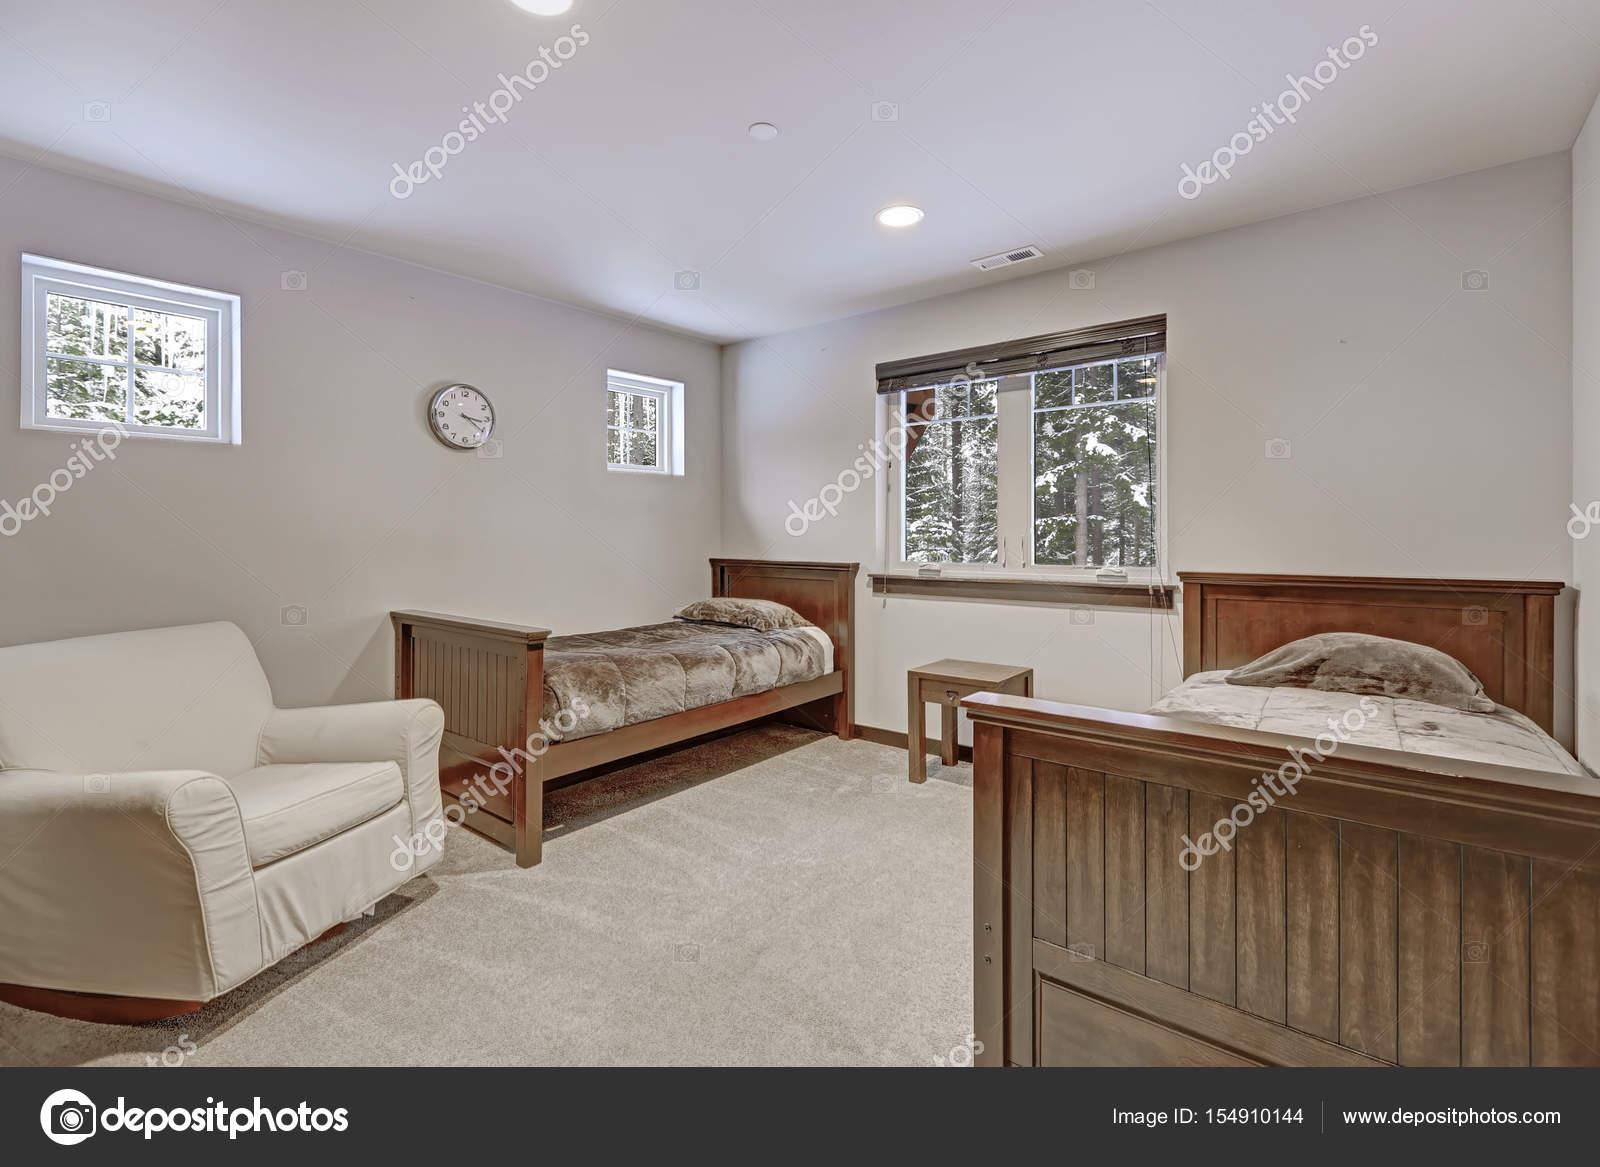 https://st3.depositphotos.com/1041088/15491/i/1600/depositphotos_154910144-stock-photo-spacious-kids-bedroom-with-light.jpg